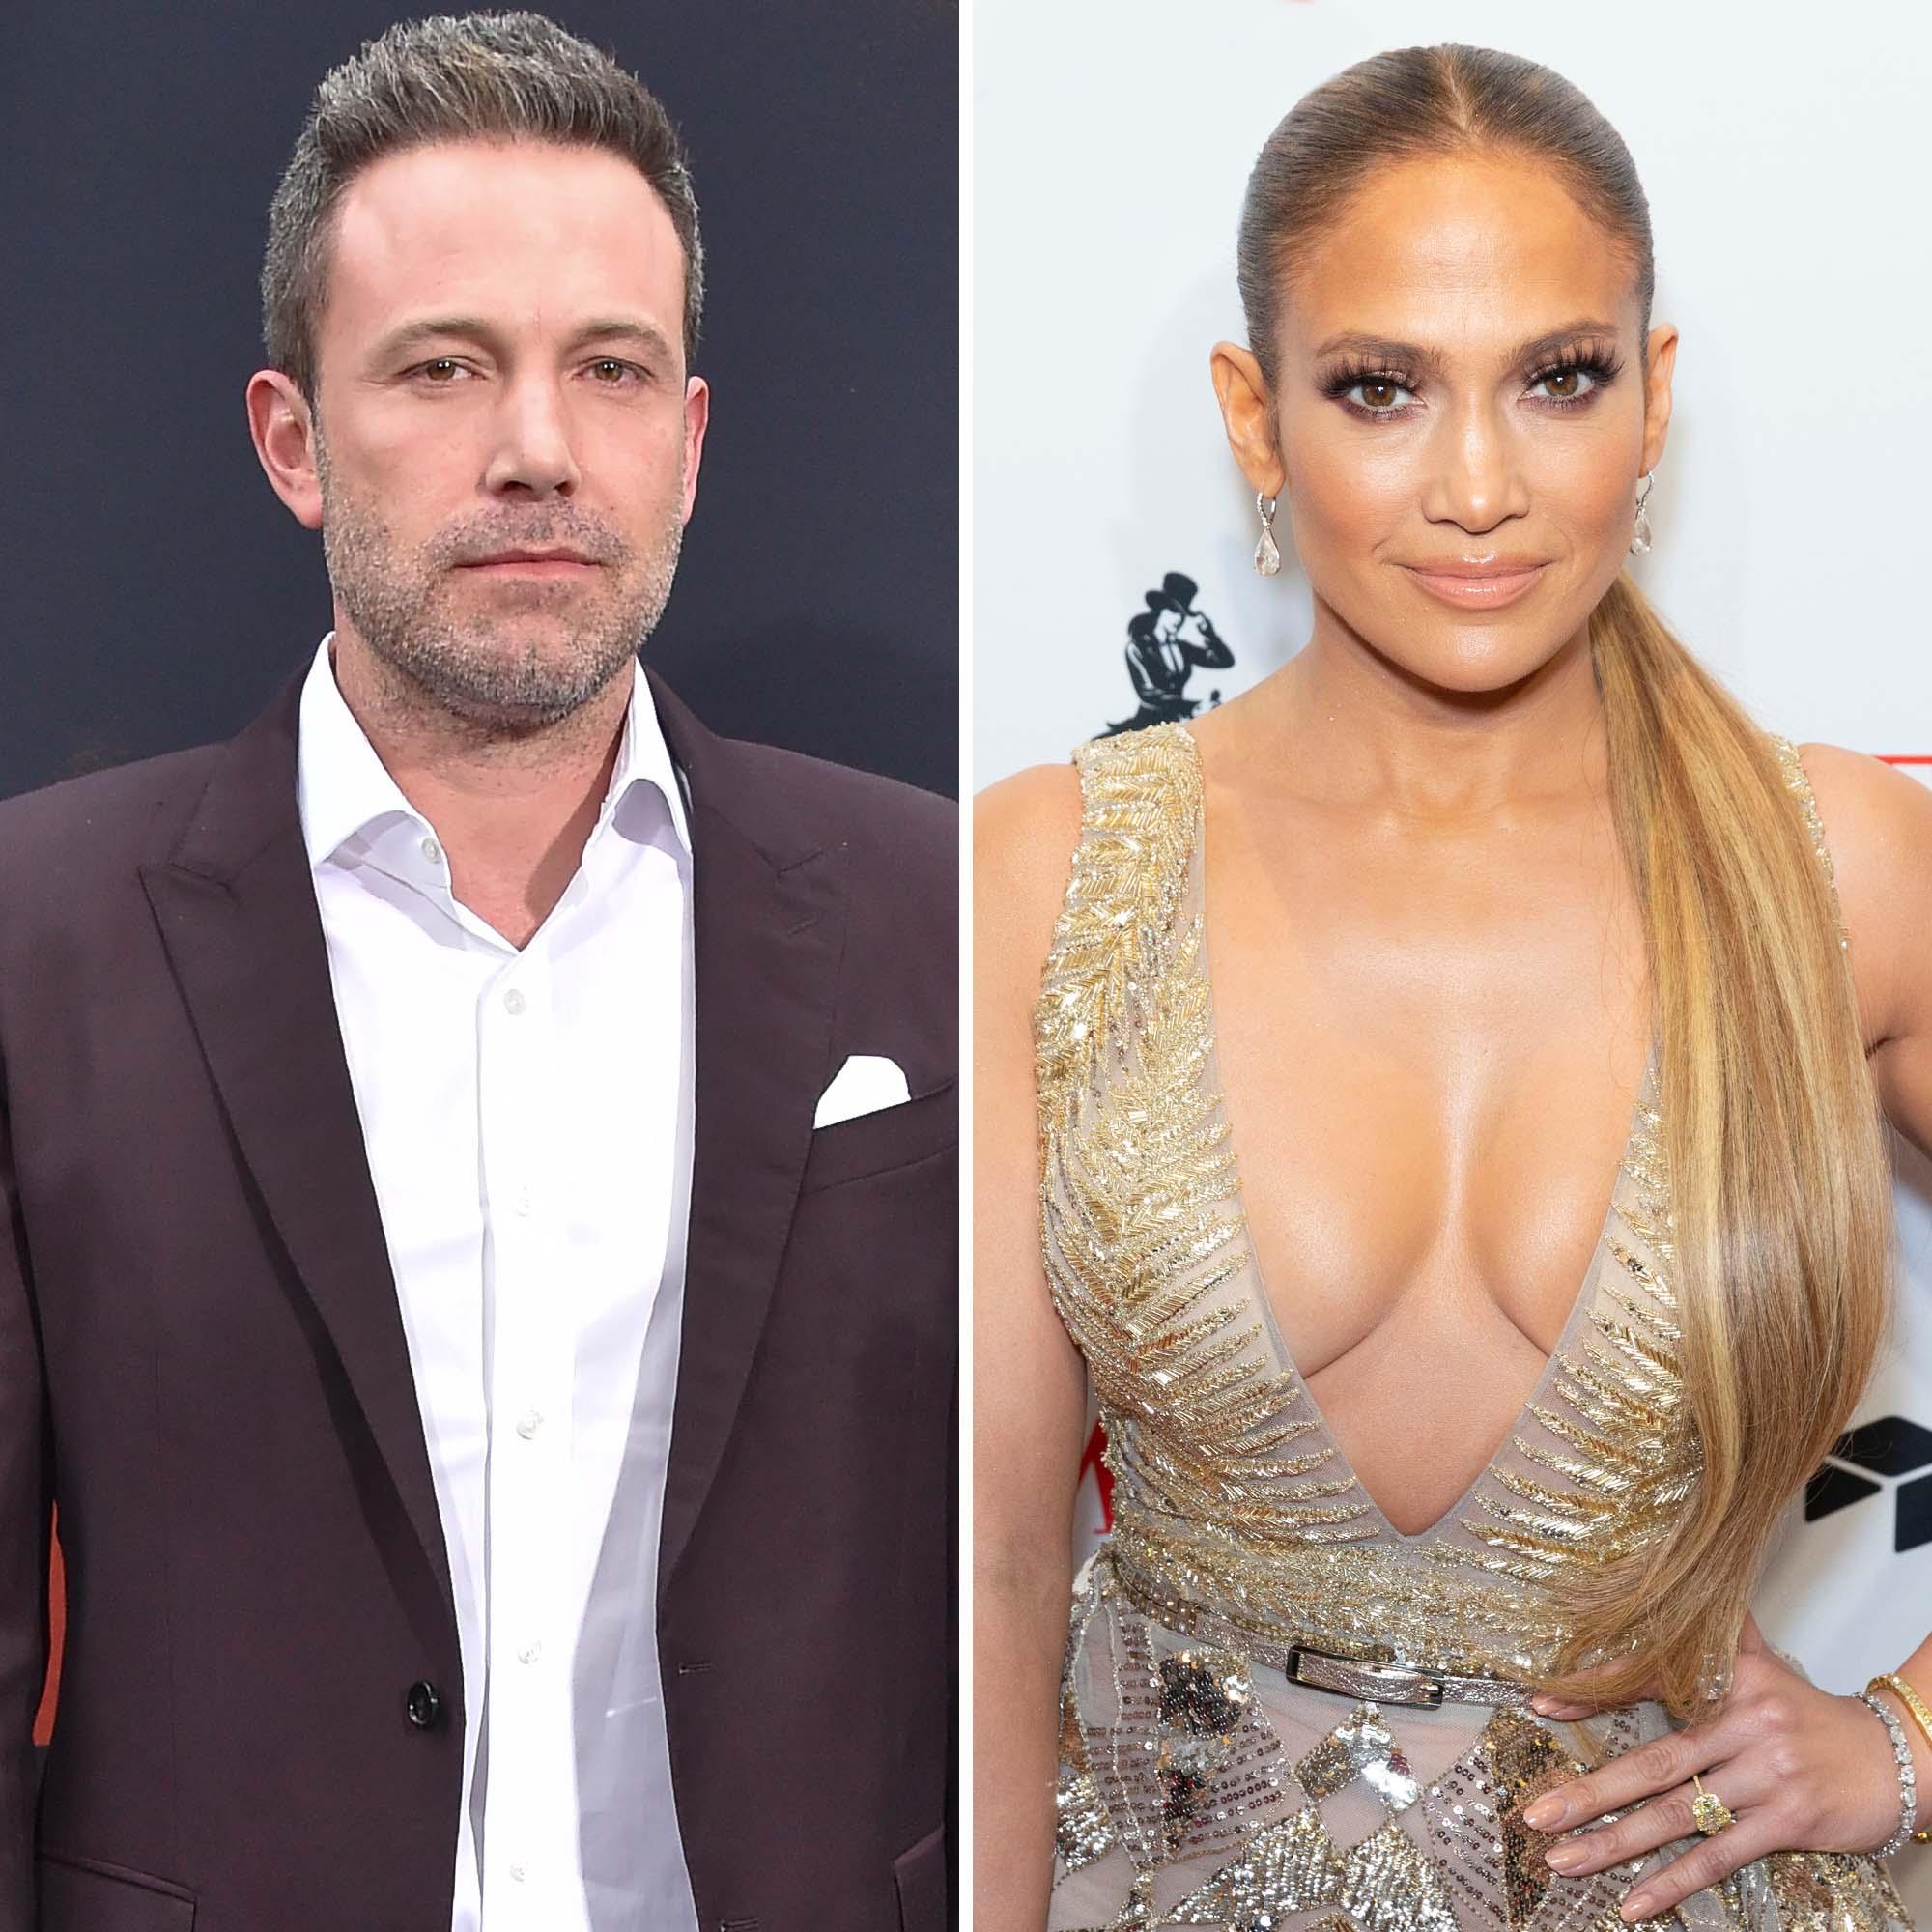 Ben Affleck and Jennifer Lopez Reunite: Exes 'Hanging Out Again'